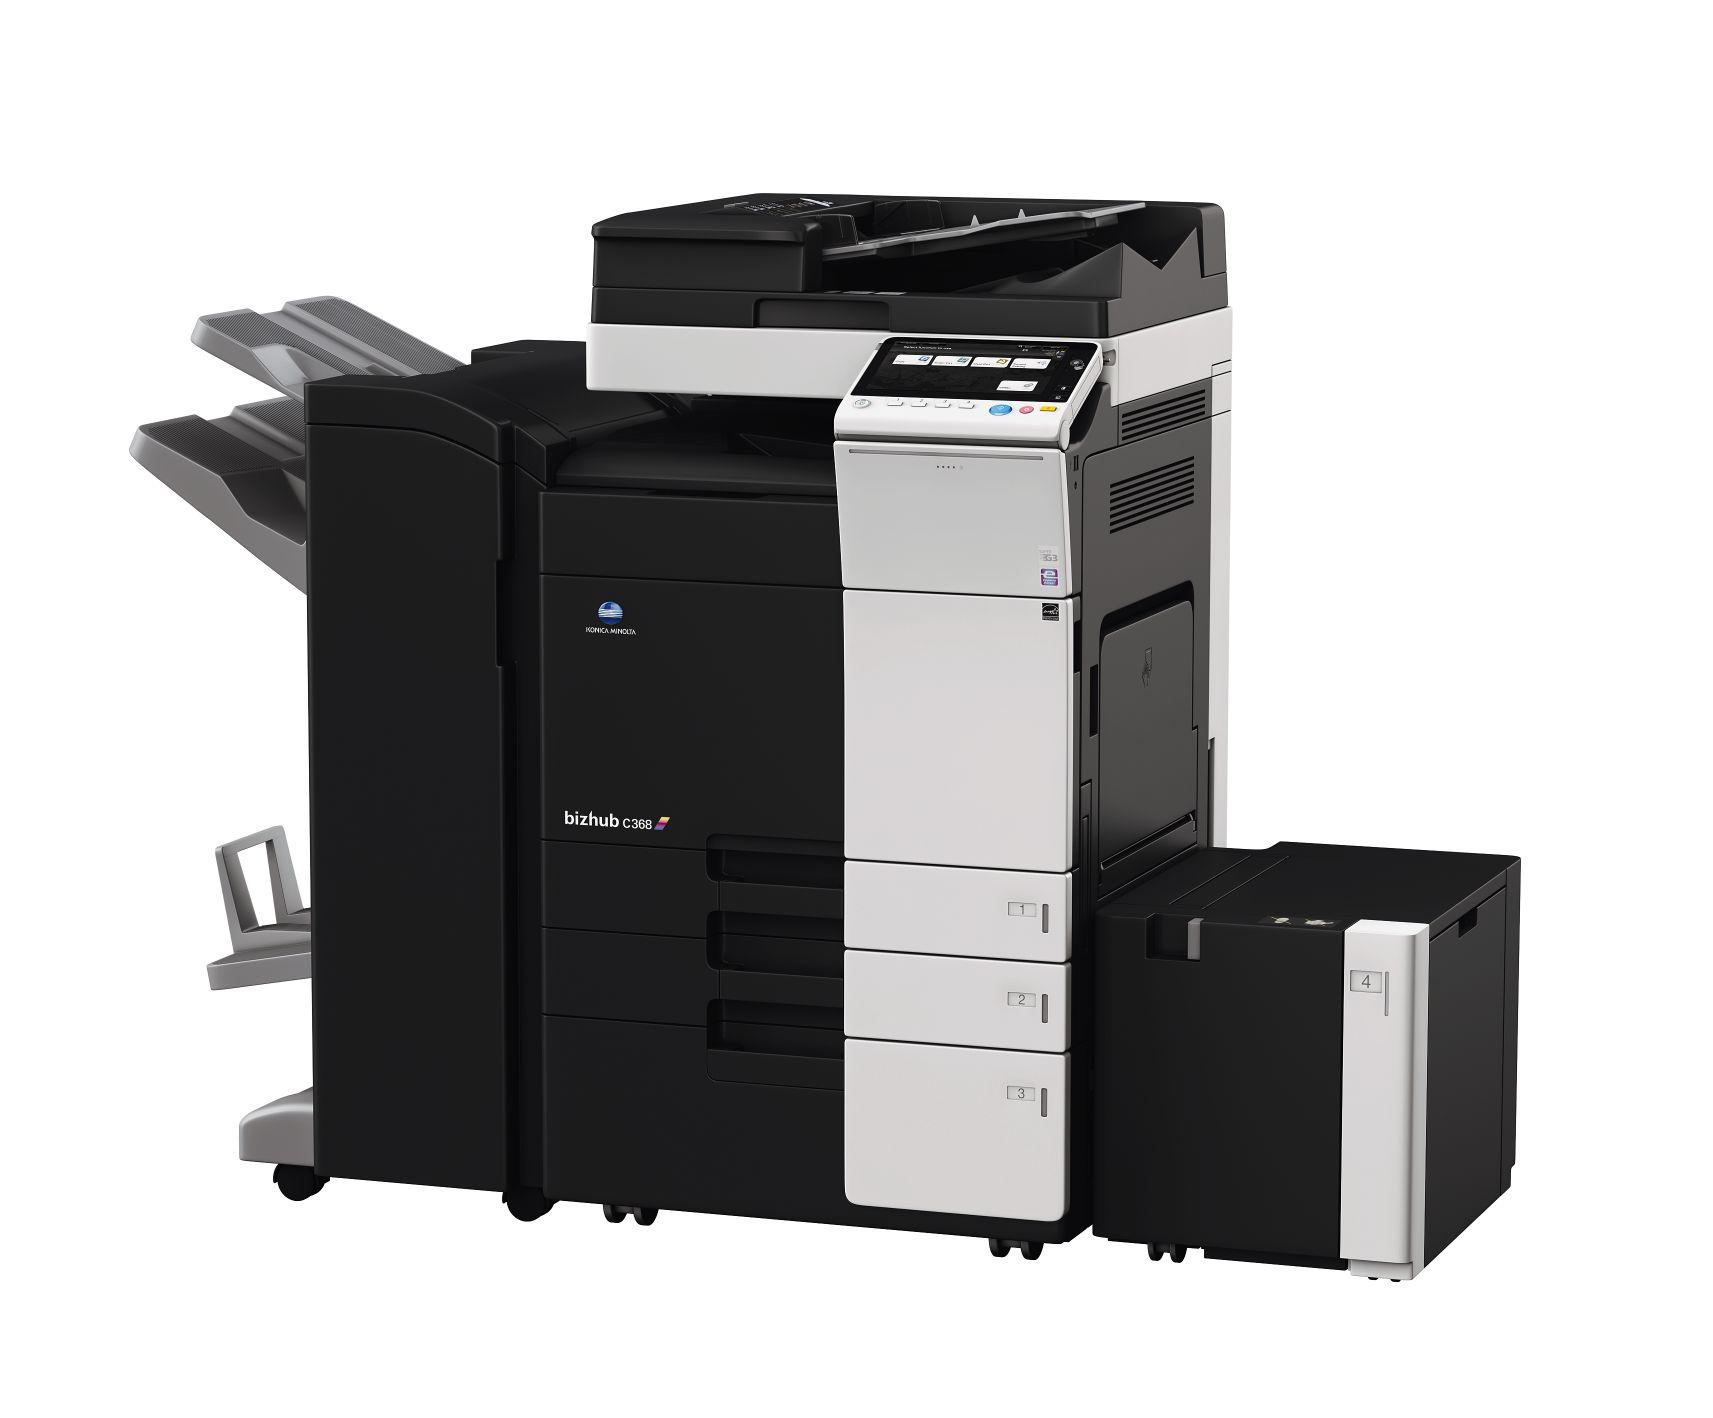 Konica Minolta Multifunctional Printers